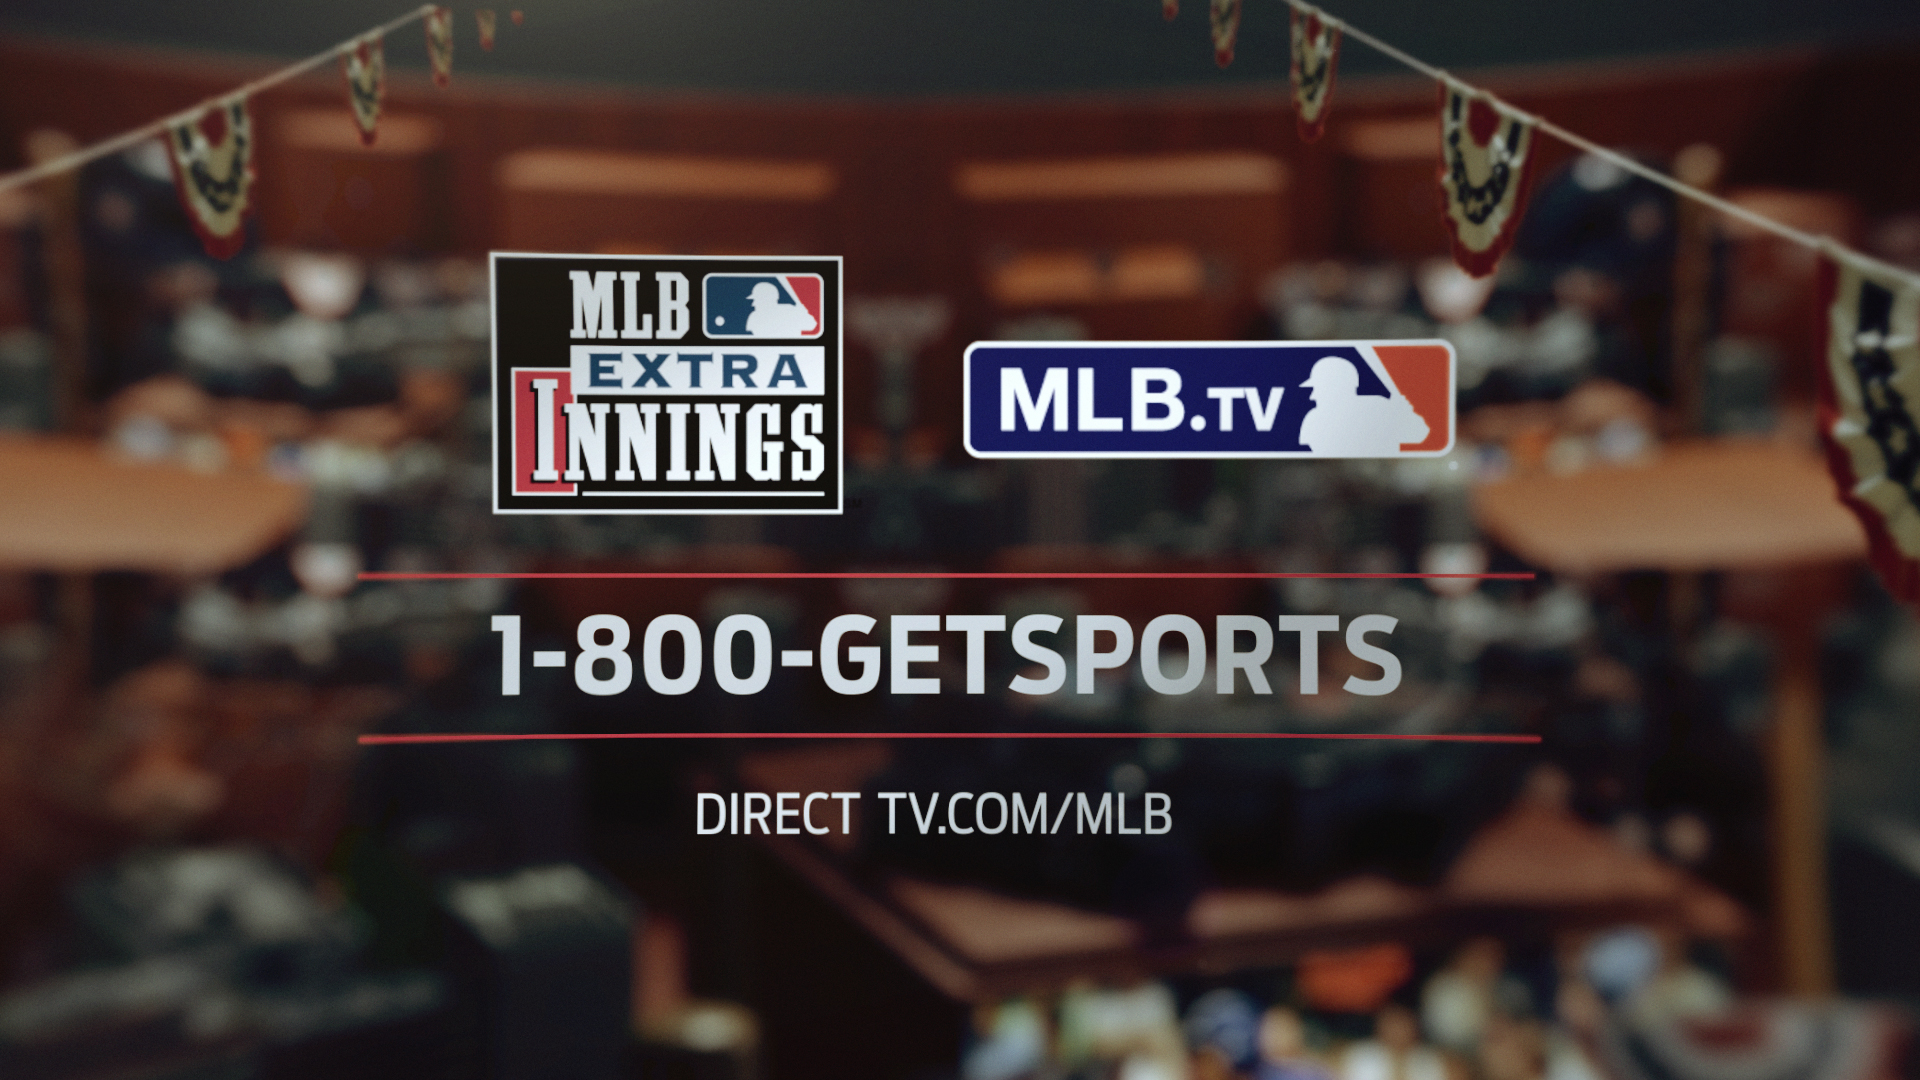 Direct Tv Mlb Extra Innings Pitch Elite Edge